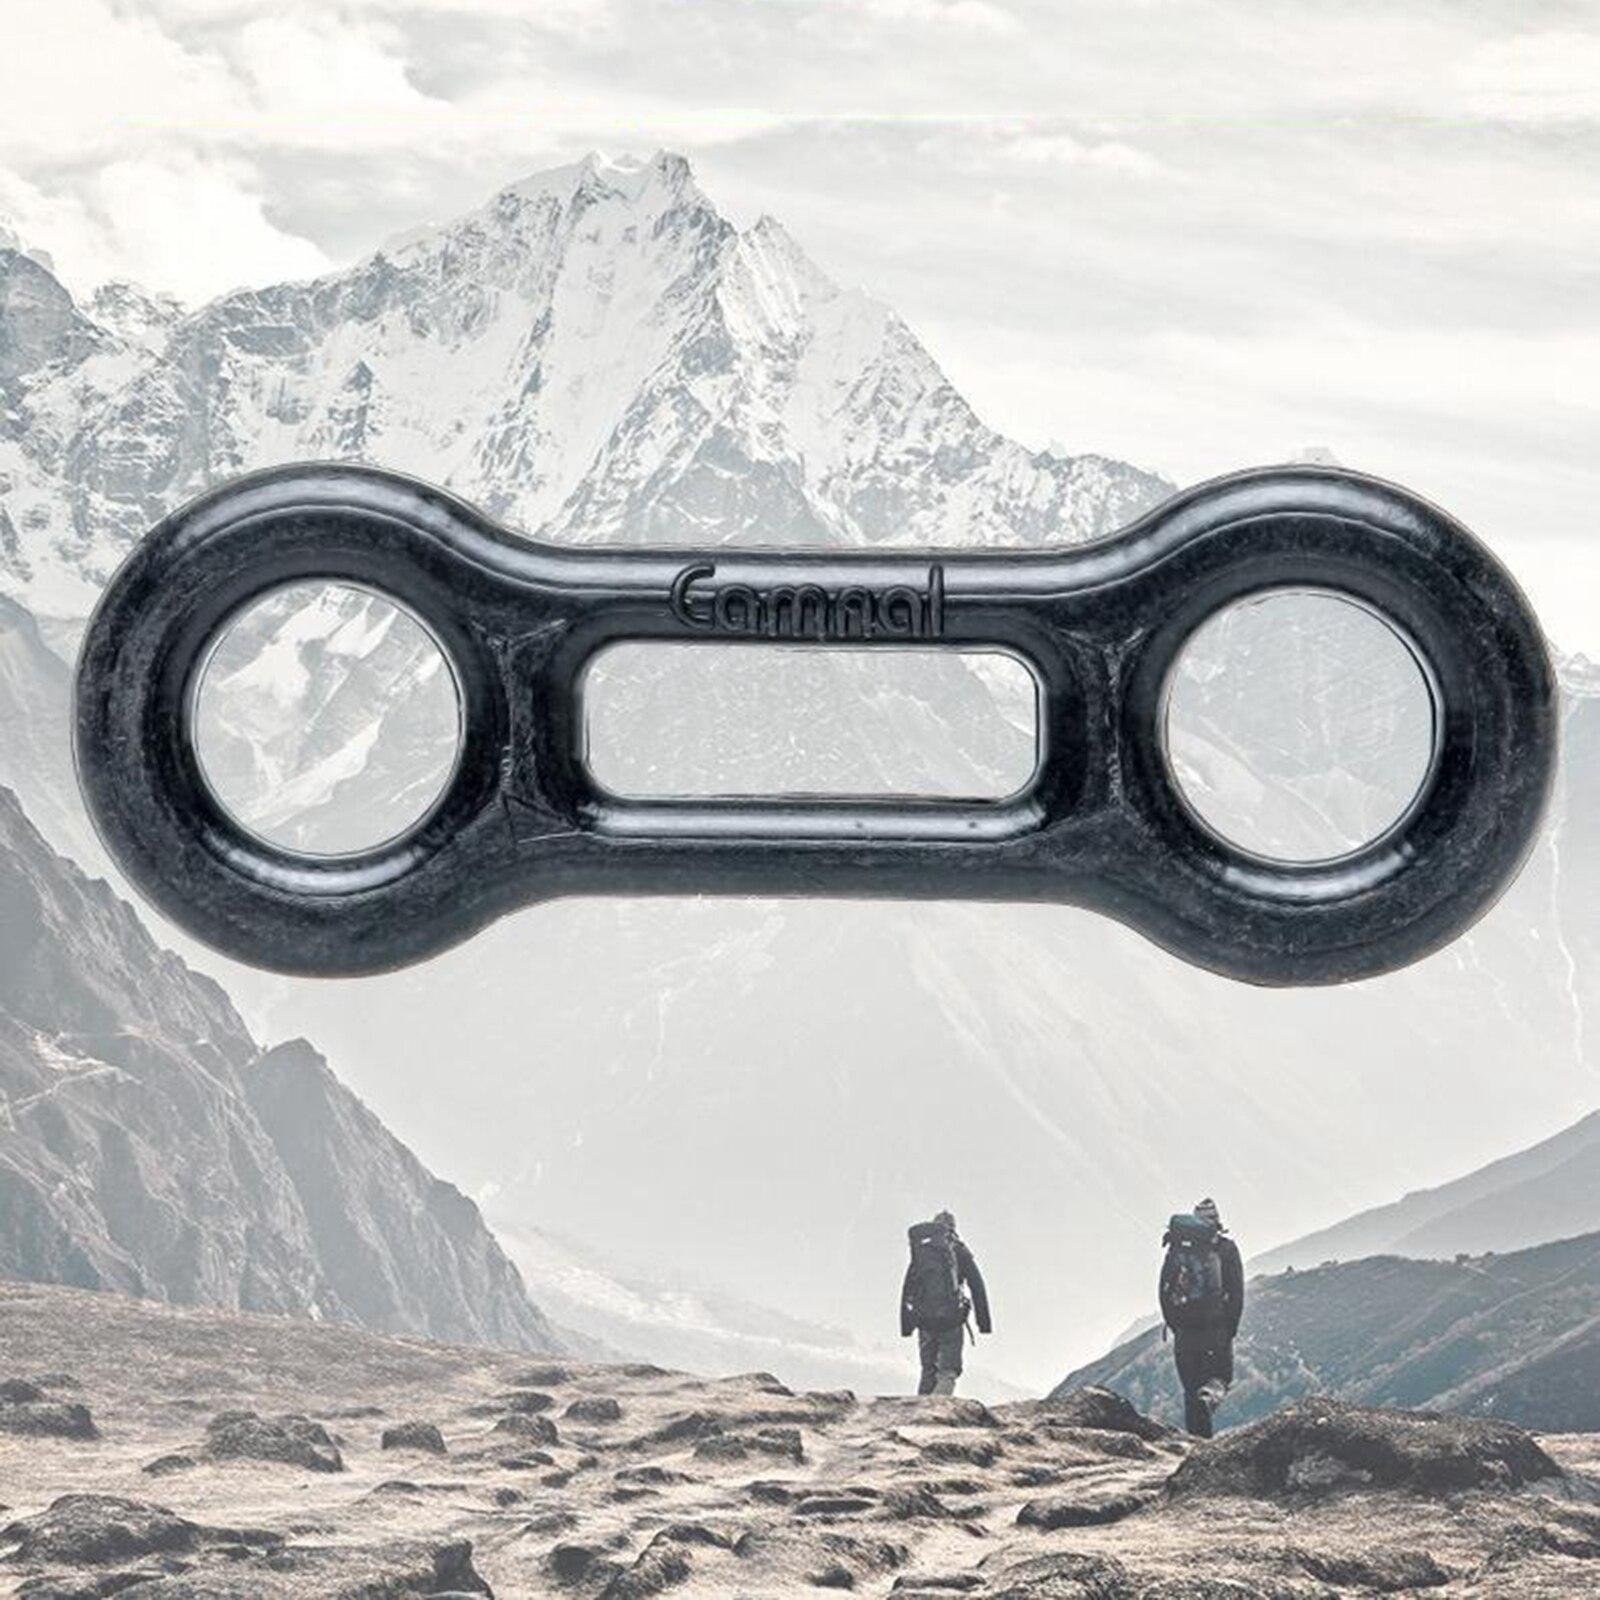 Carabiner Locking Tool Rigging Fixing Climbing Safety  Equipment